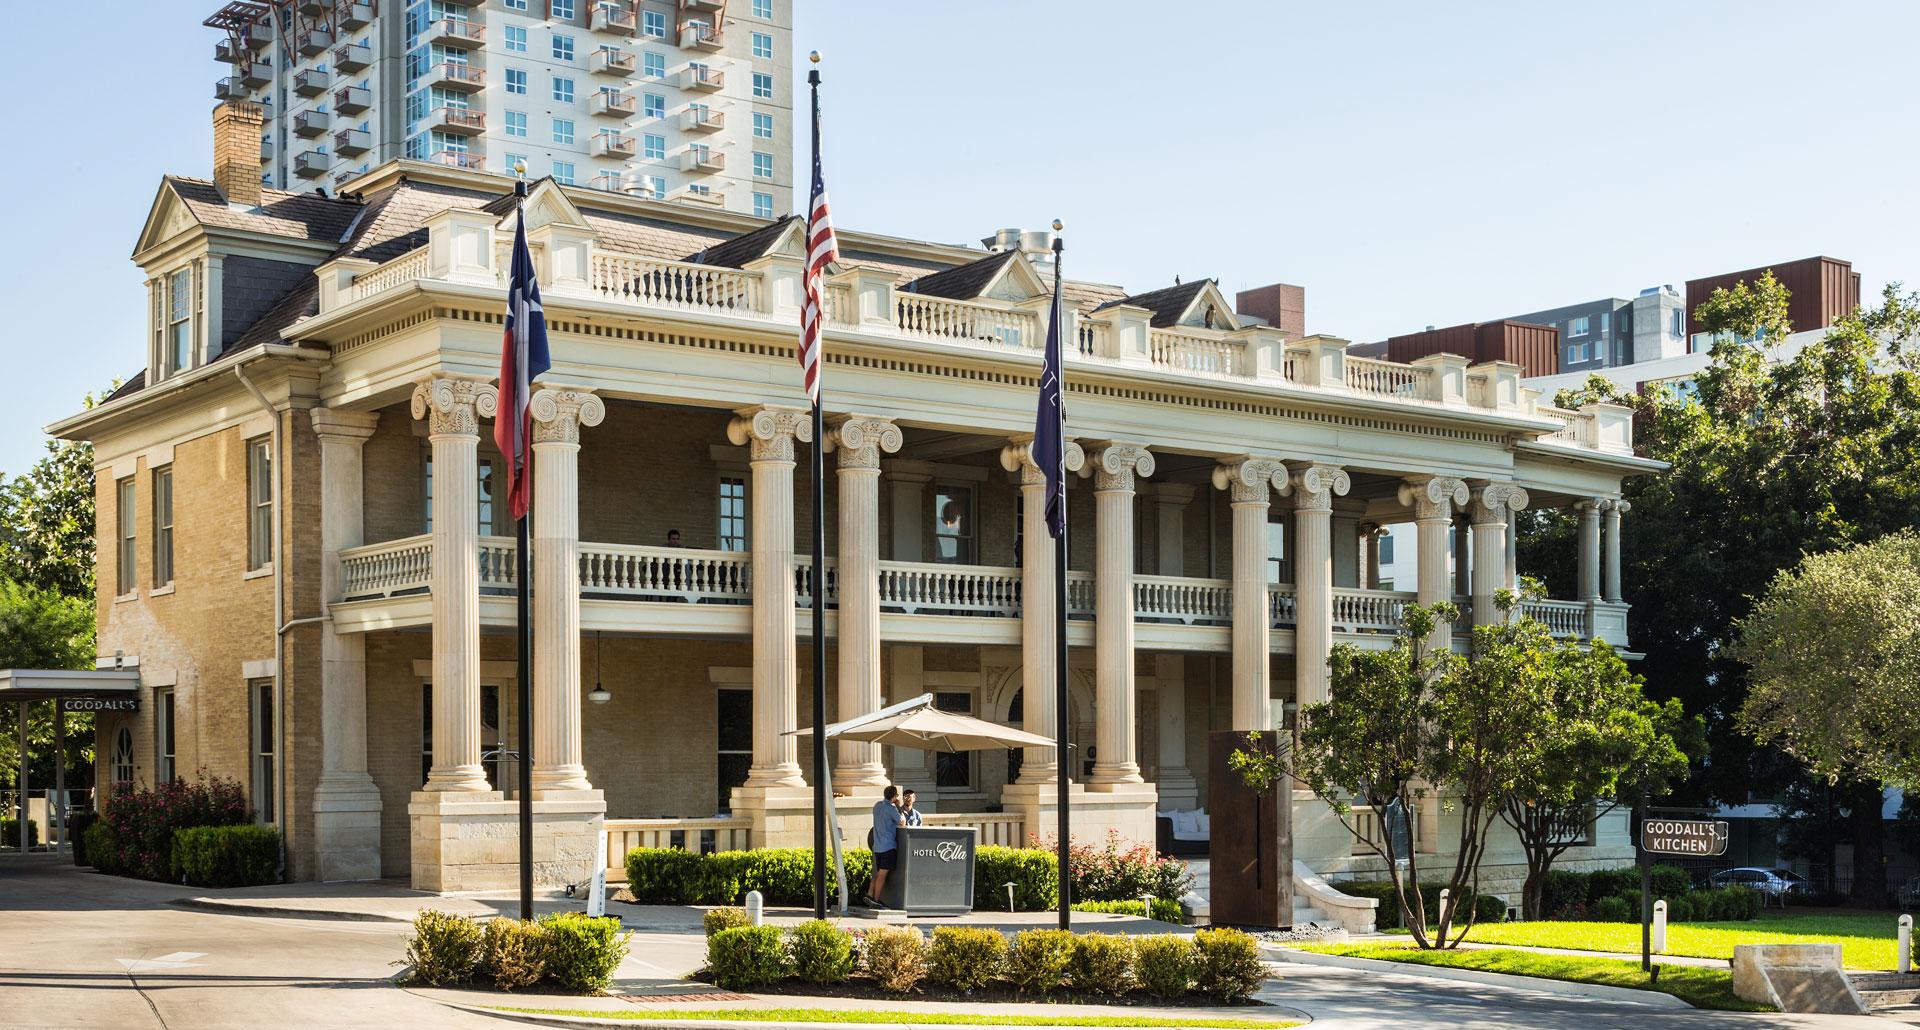 Hotel Ella - boutique hotel in Austin